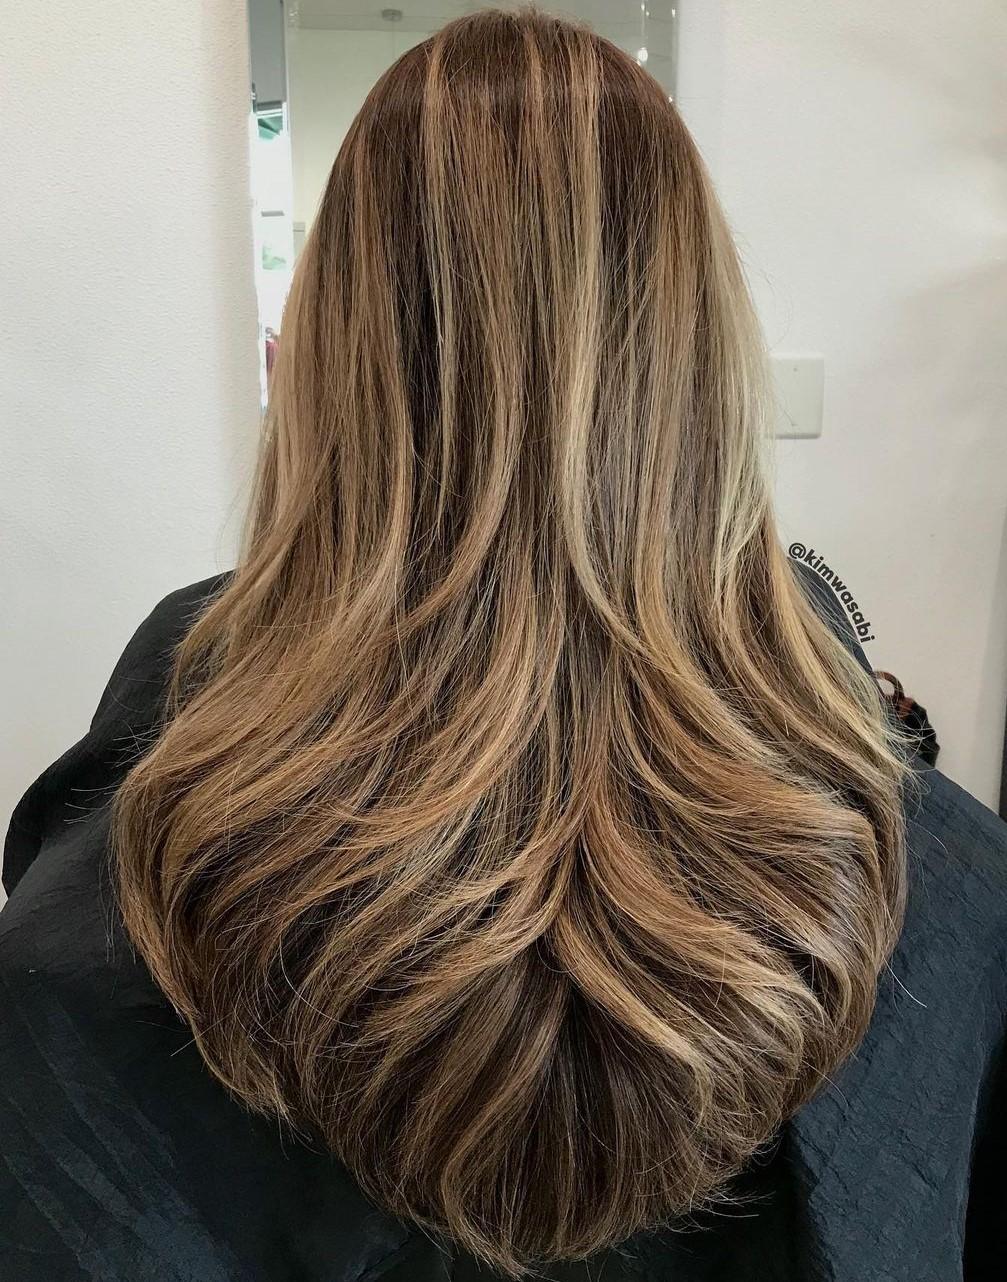 Long Layered V-Cut Hairstyle